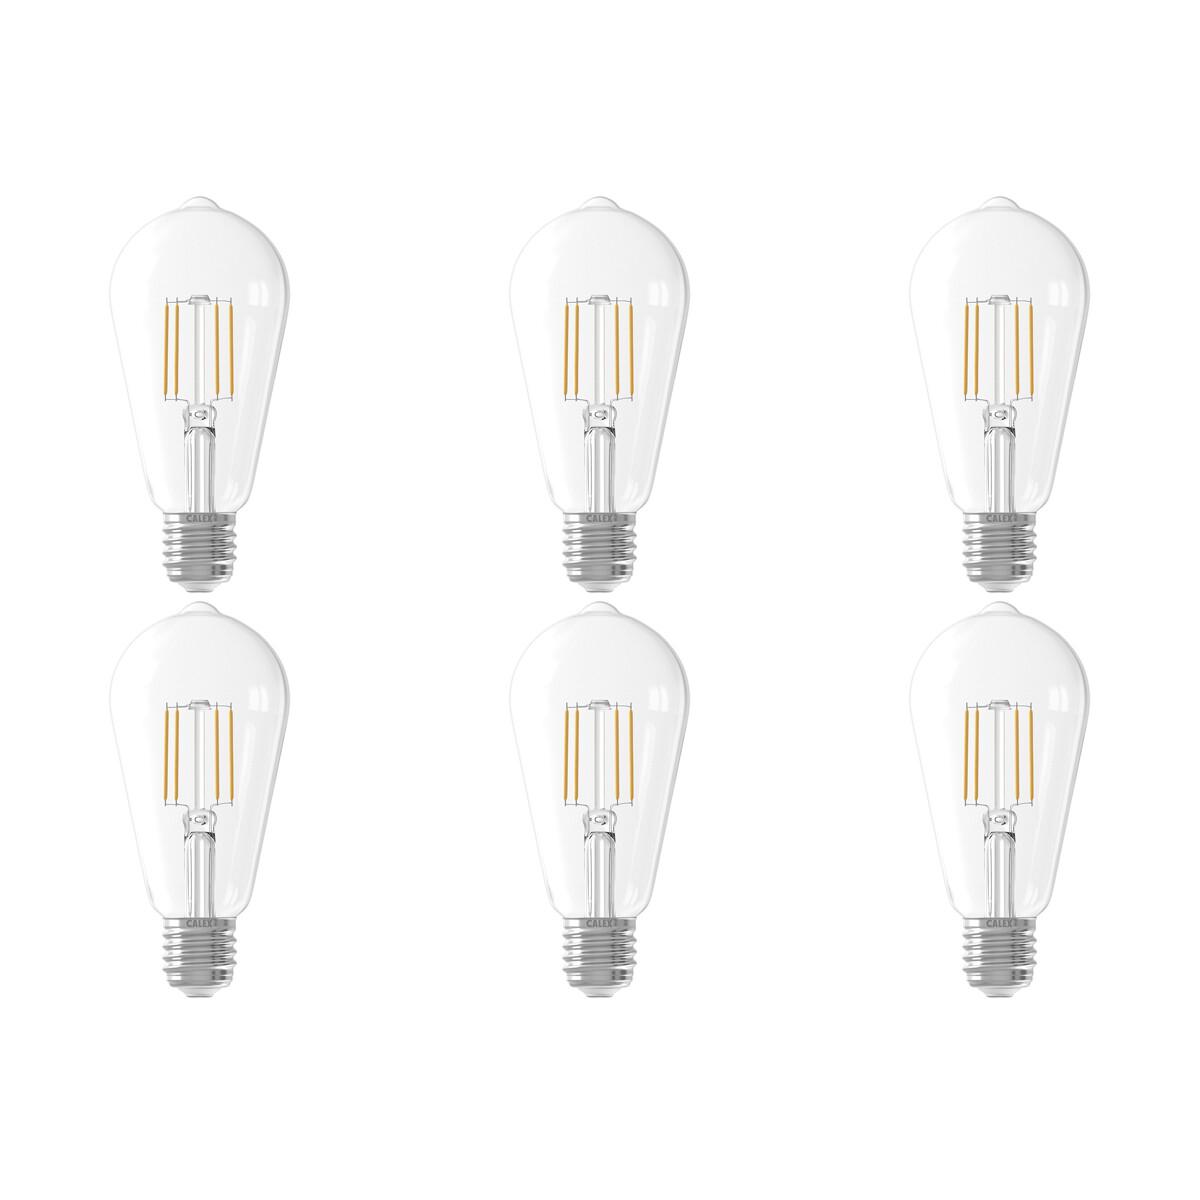 CALEX - LED Lamp 6 Pack - Filament ST64 - E27 Fitting - 6W - Warm Wit 2700K - Transparant Helder